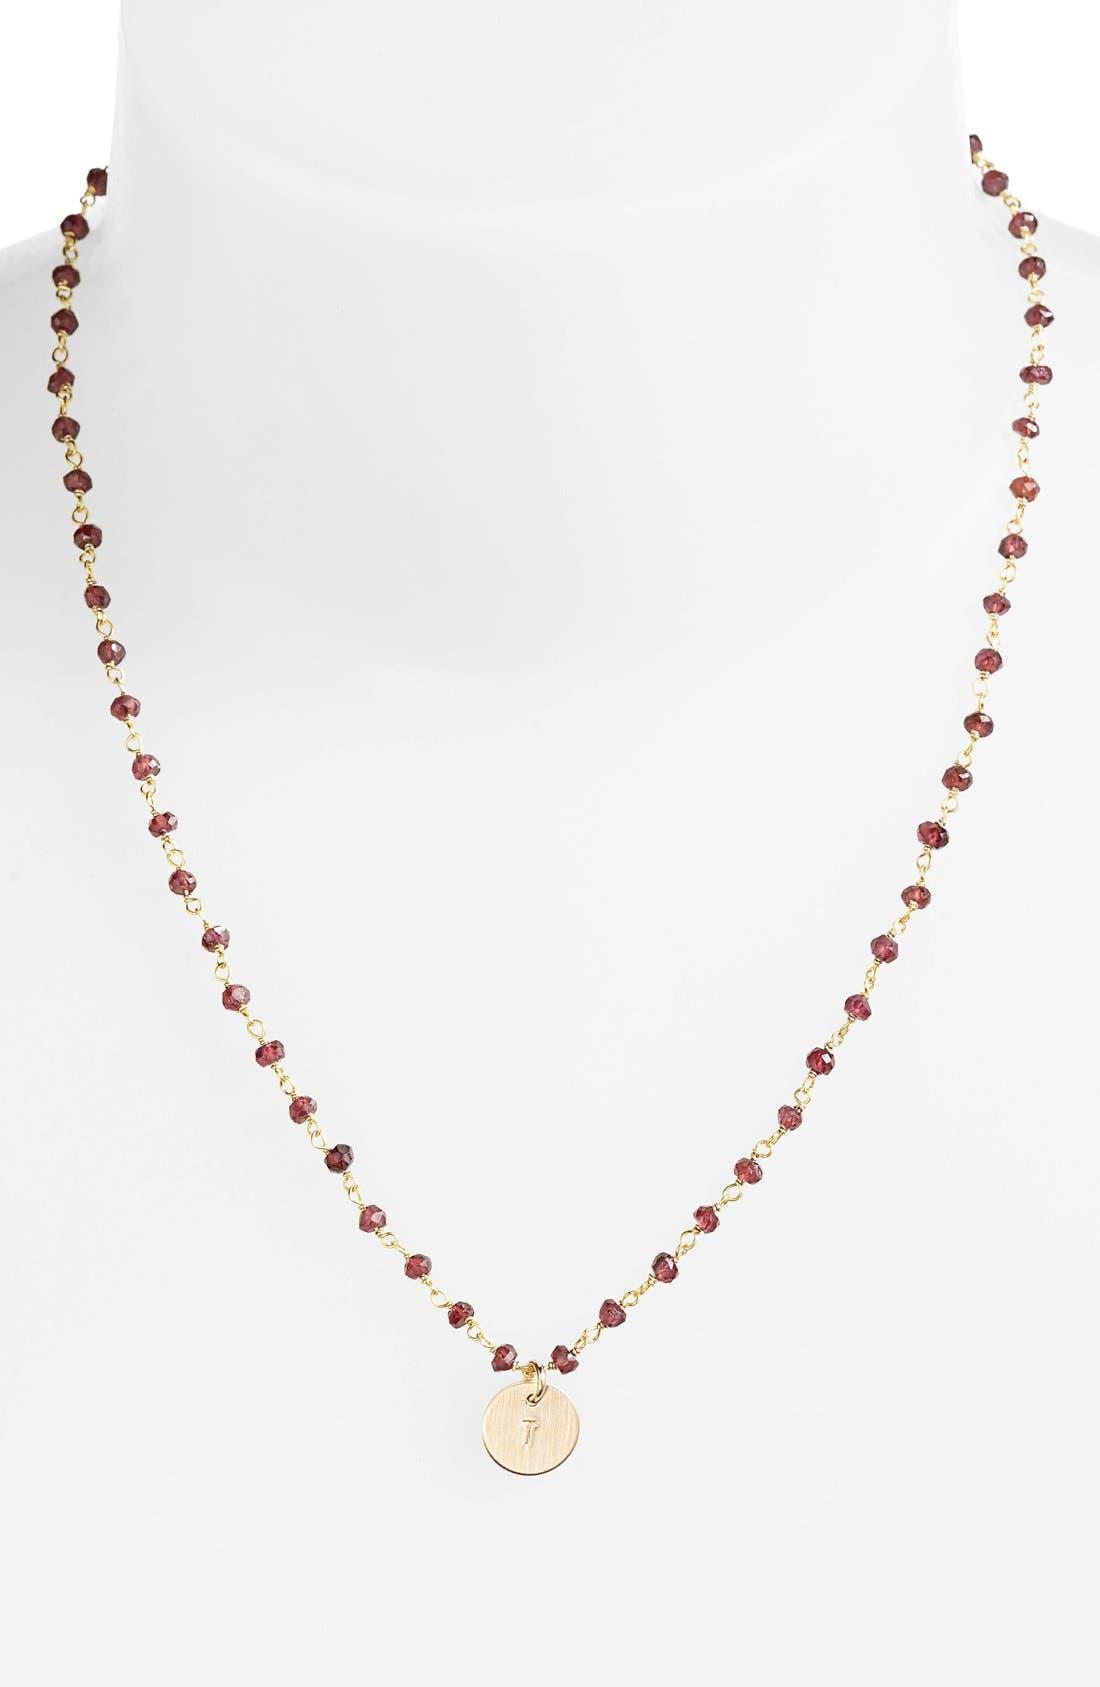 Alternate Image 1 Selected - Nashelle 14k-Gold Fill Mini Initial Disc Garnet Chain Necklace